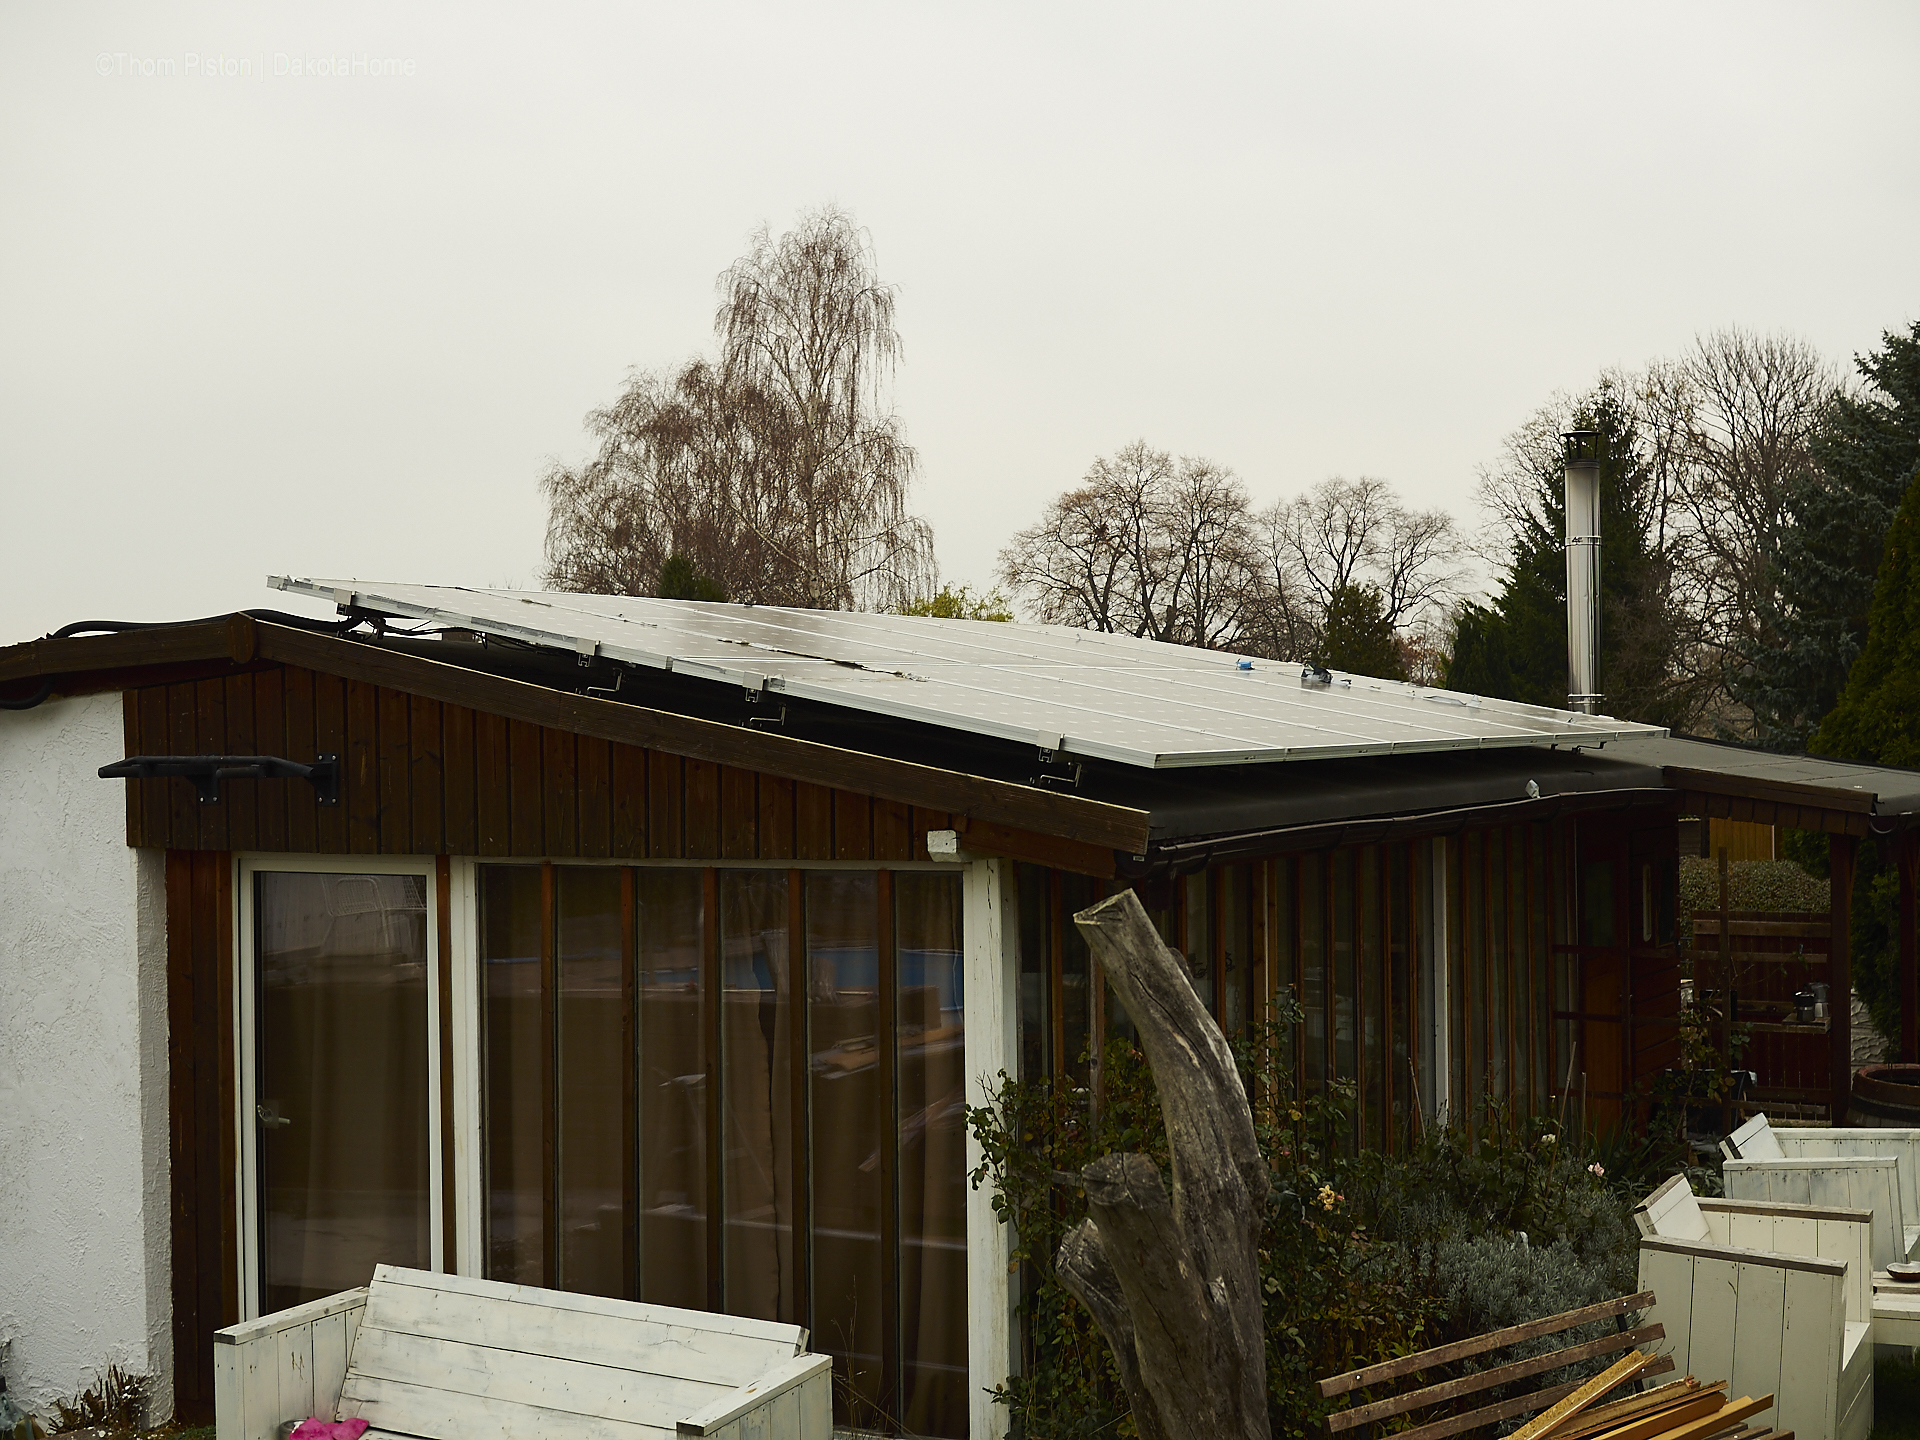 Solar | Photovoltaik Anlage am Tinyhouse in Brandenburg